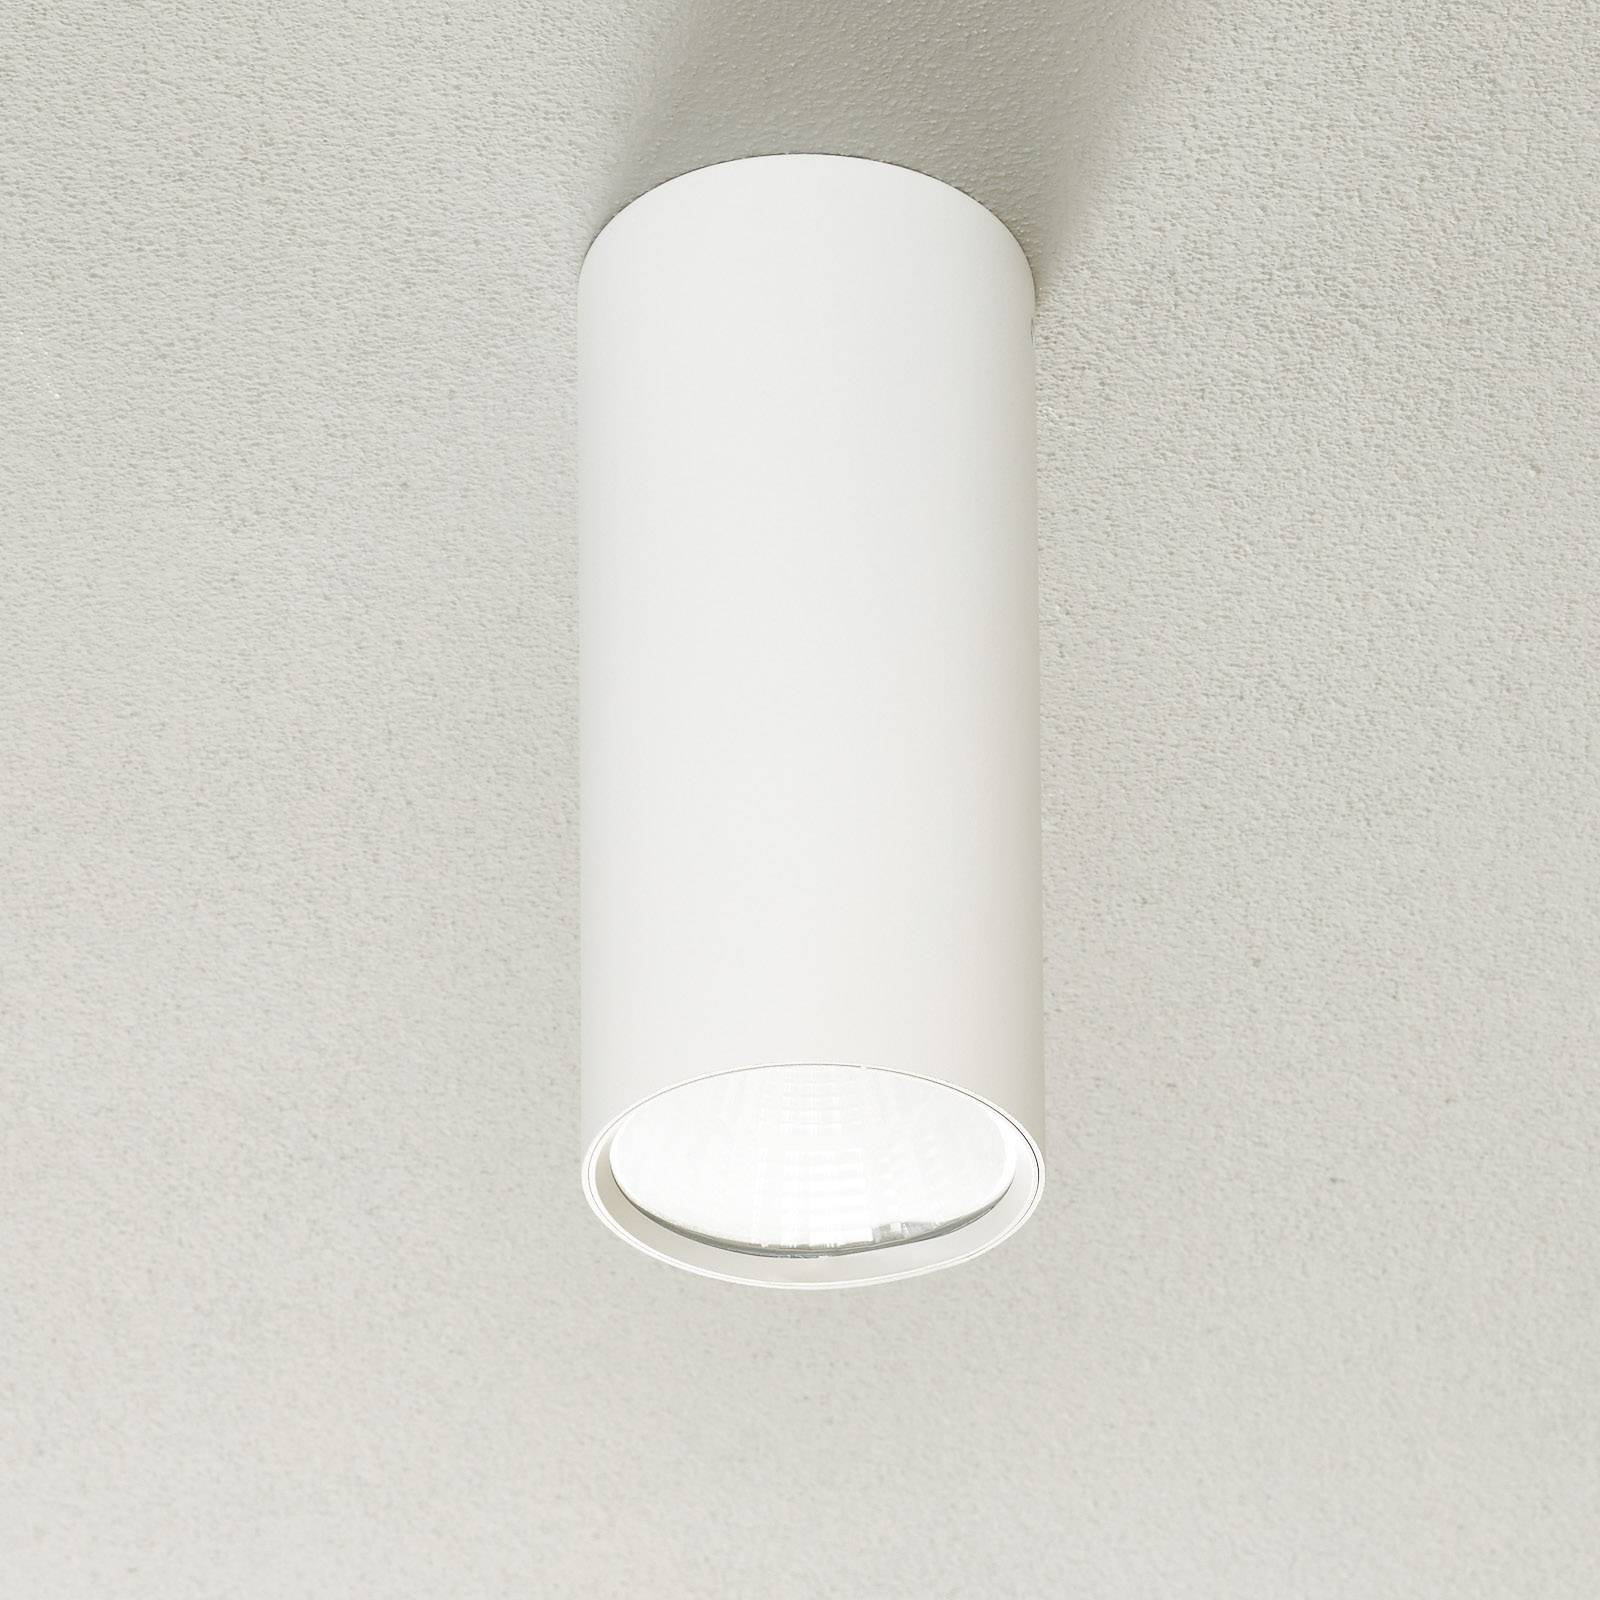 Lucande Takio -LED-alasvalo 2700K 10 cm valkoinen